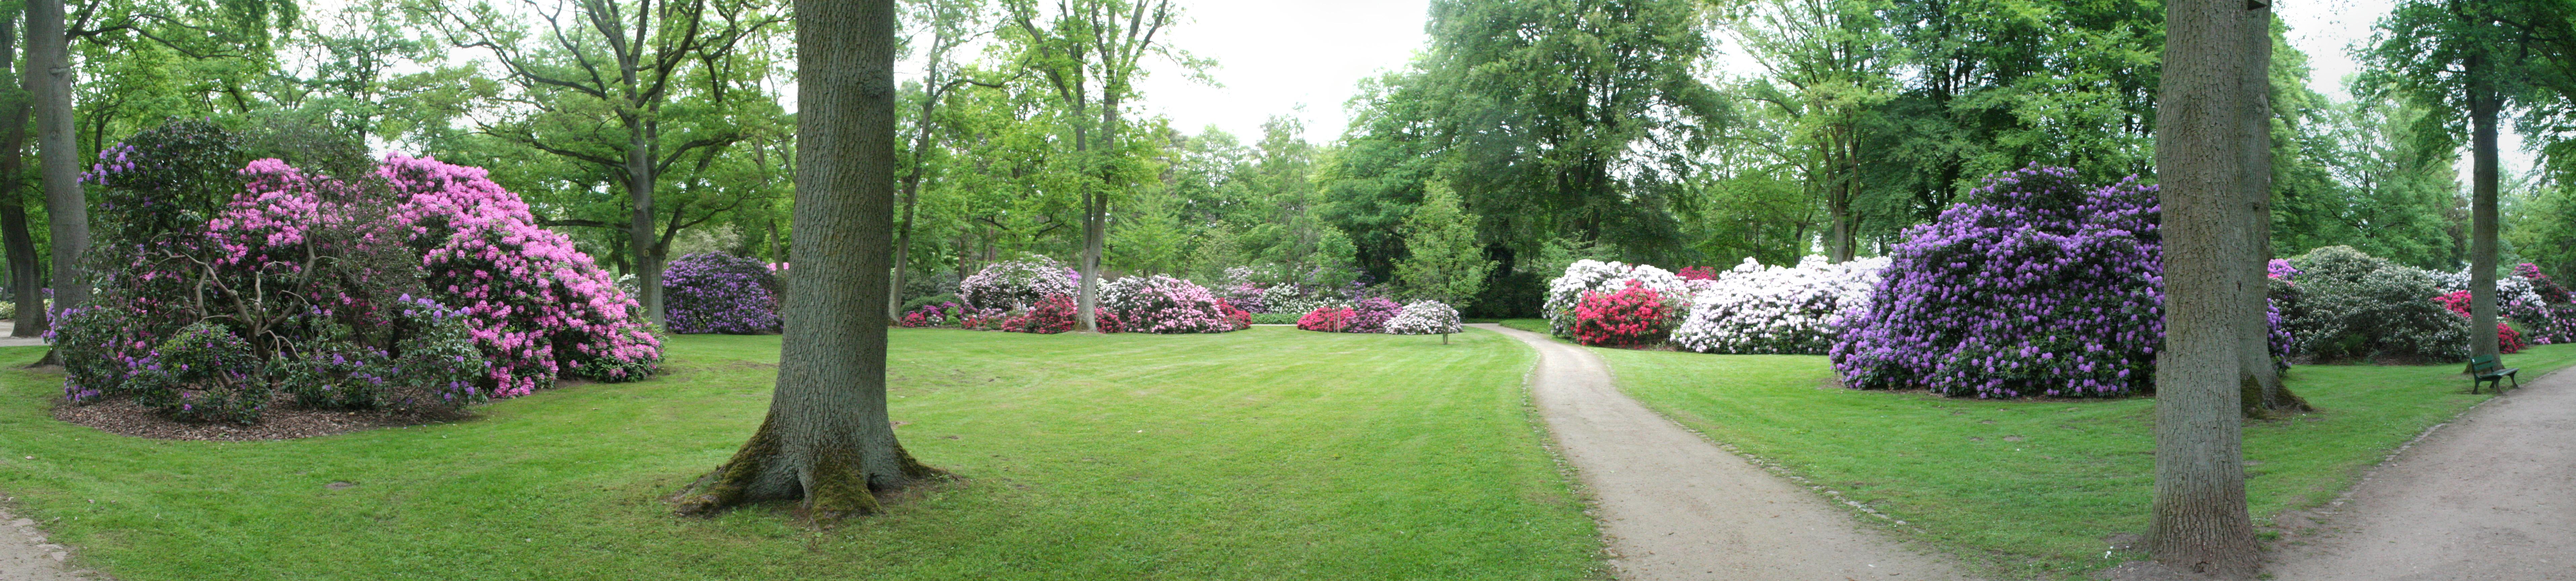 datei rhododendronpark bremen 14 05 09 wikipedia. Black Bedroom Furniture Sets. Home Design Ideas